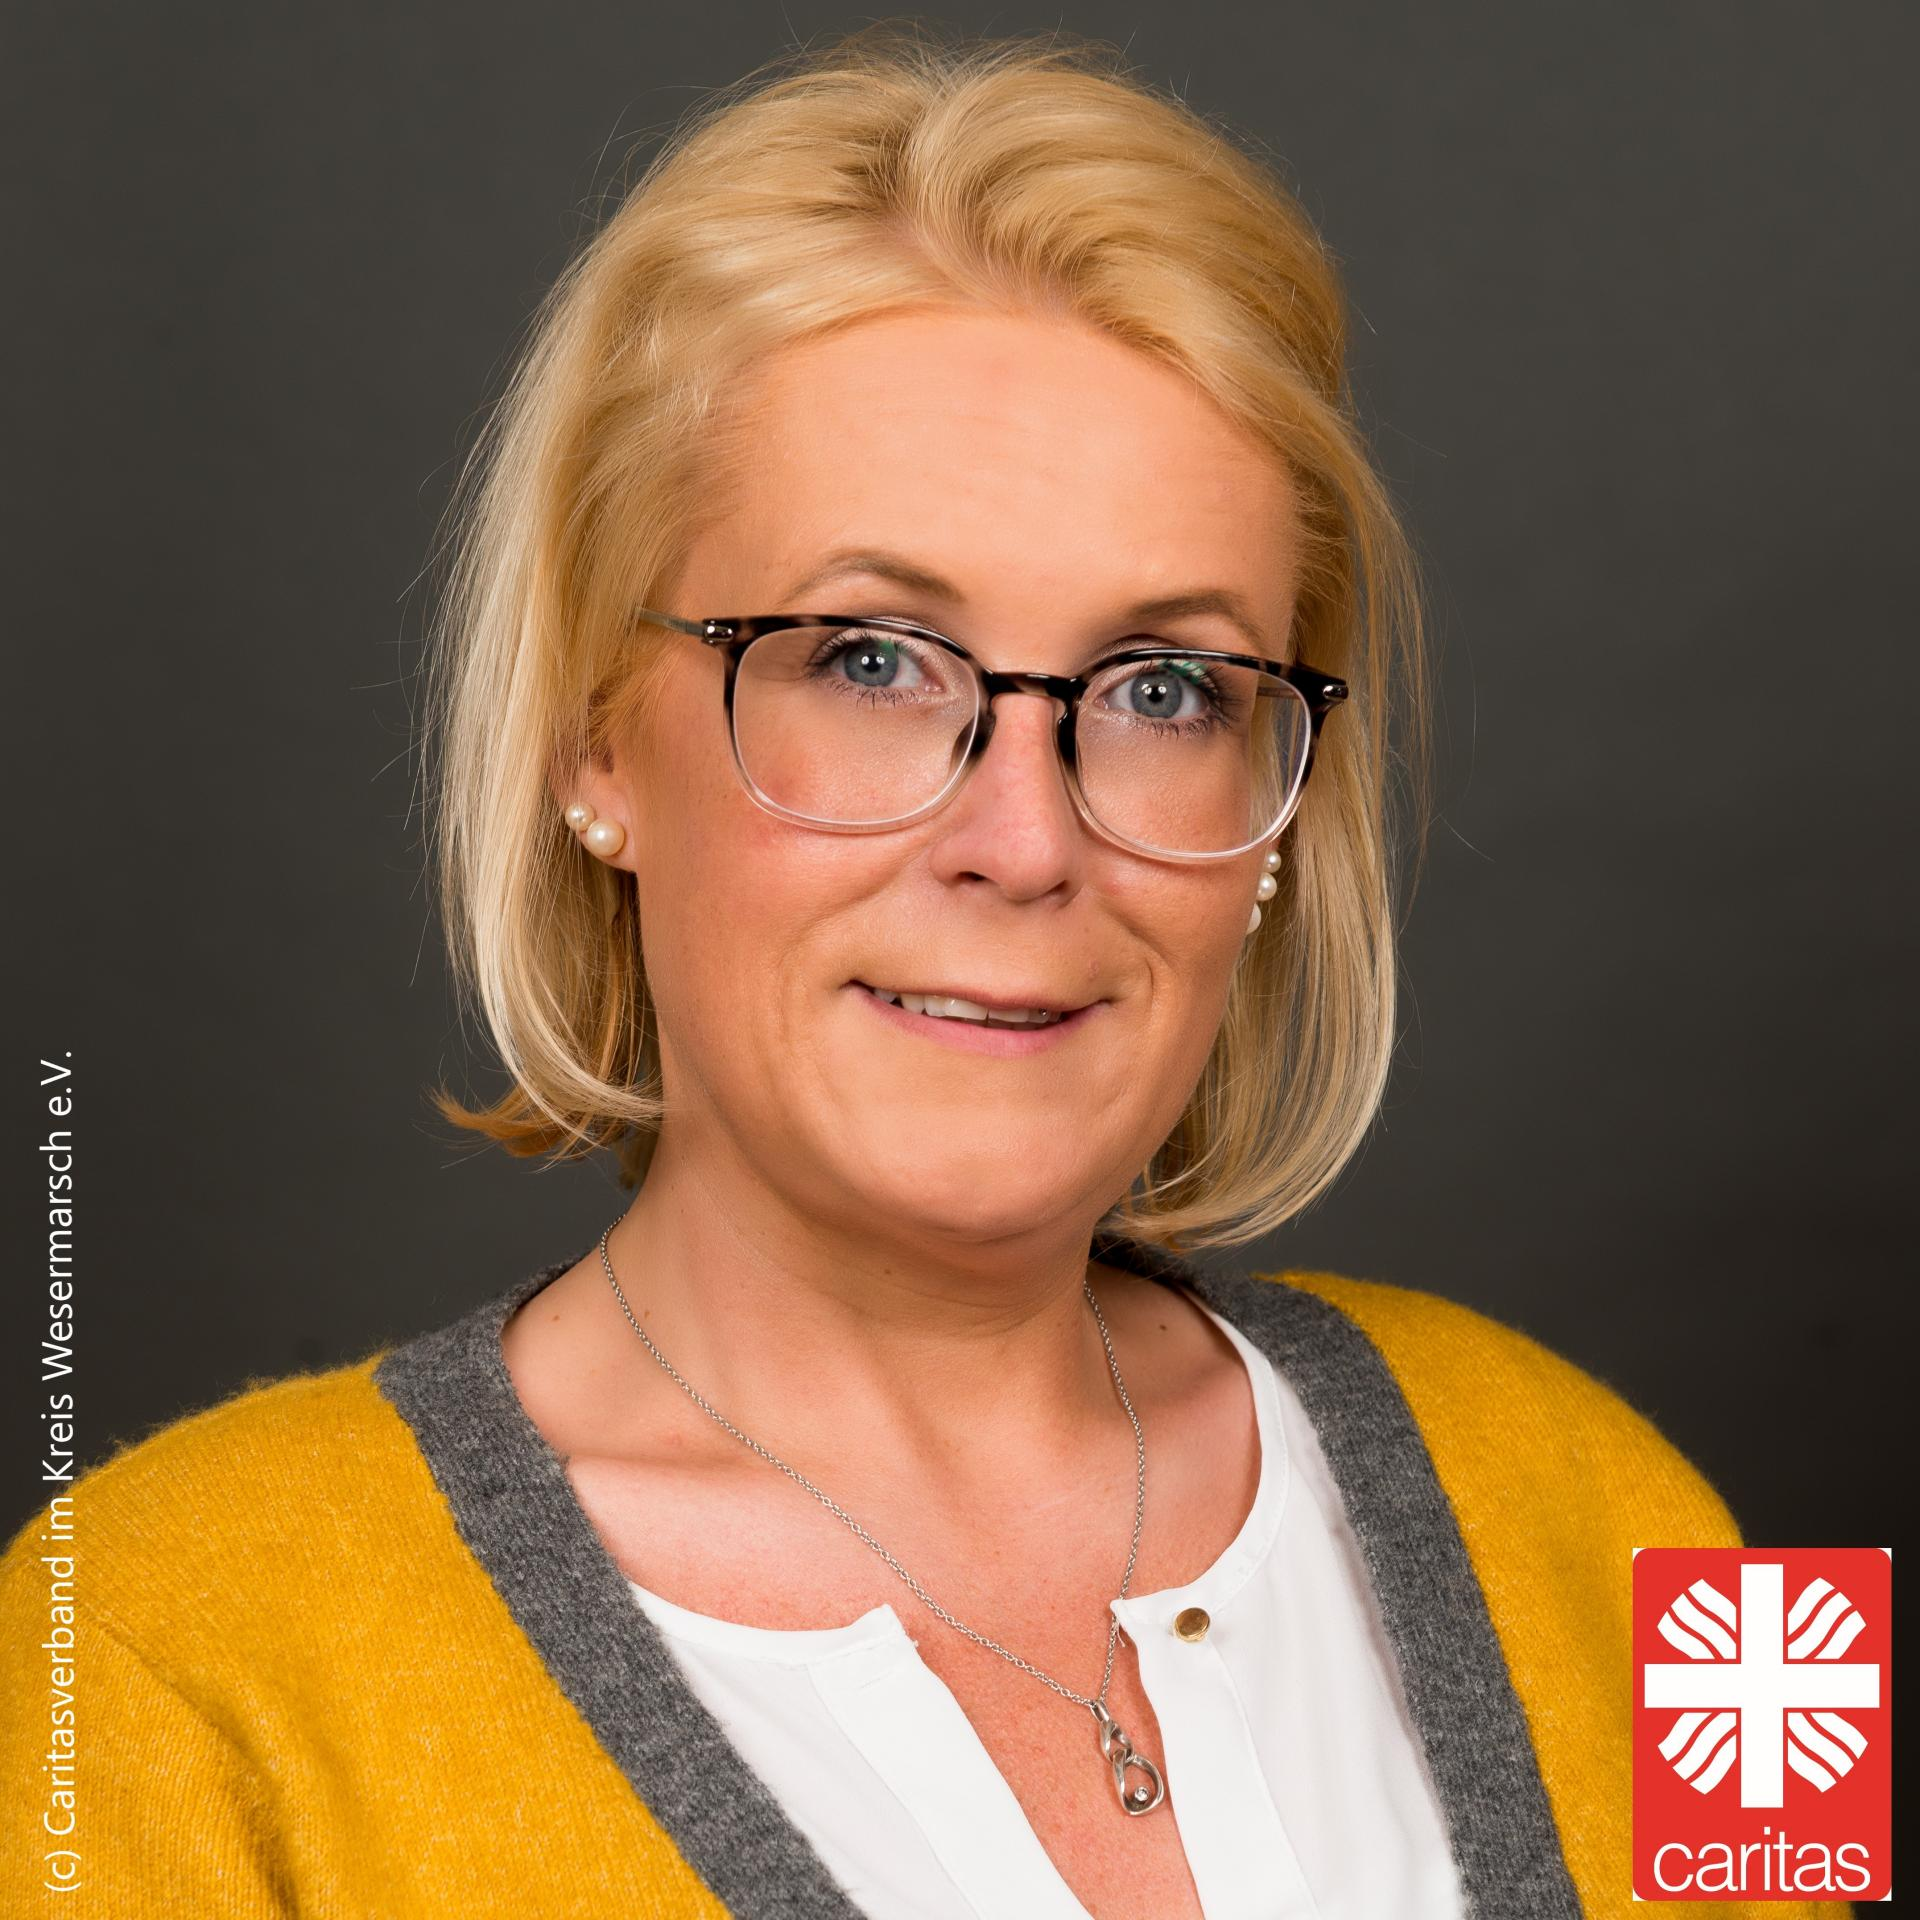 Frau Danowski